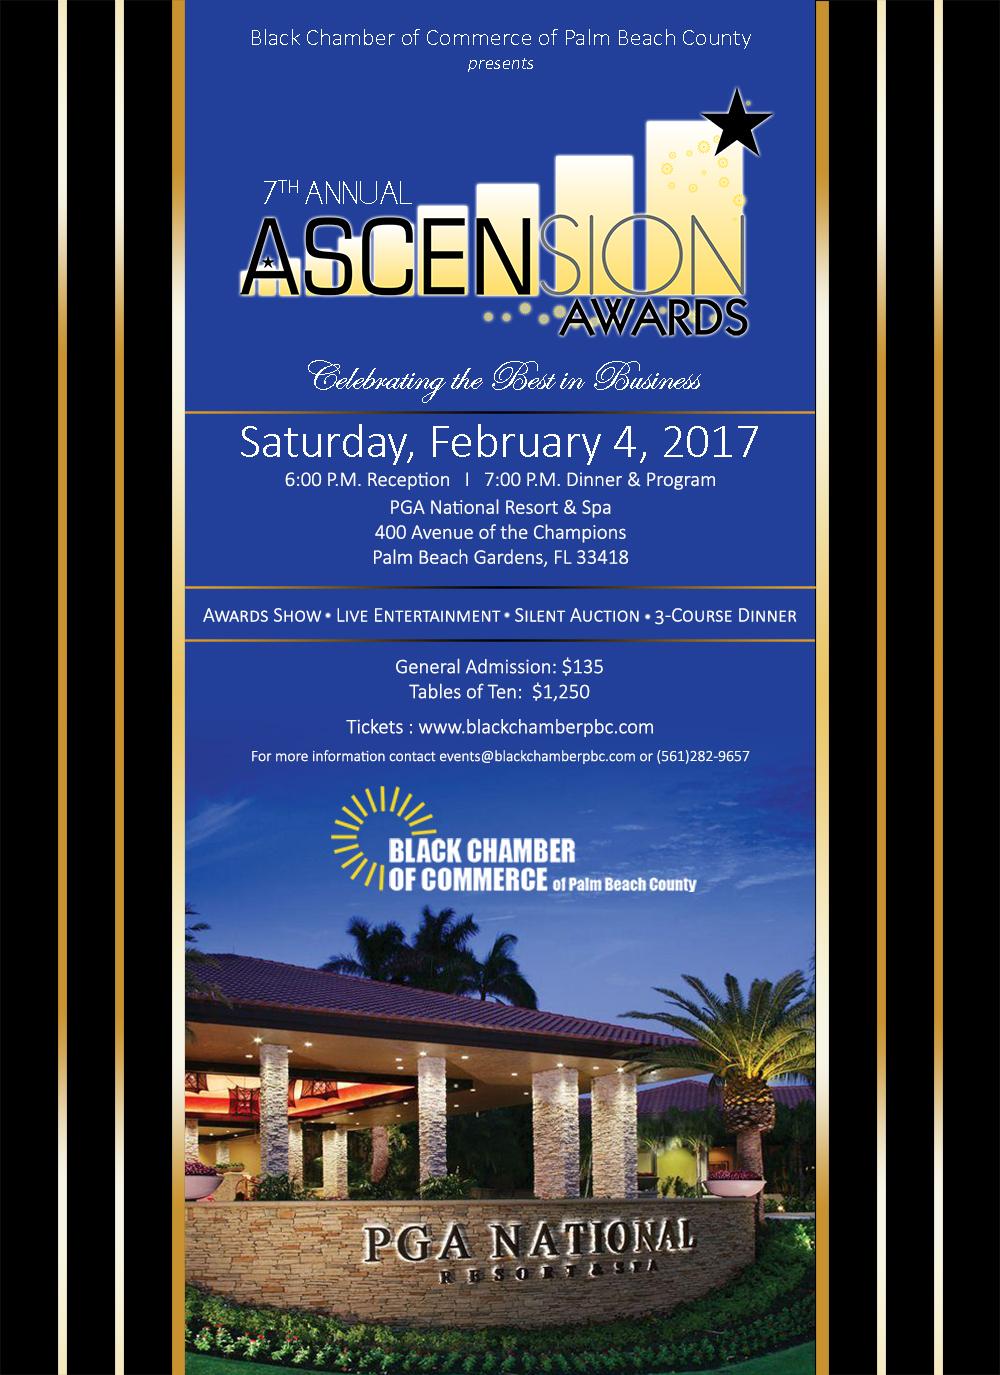 7th Annual Ascension Awards @ PGA National Resort & Spa | Palm Beach Gardens | Florida | United States